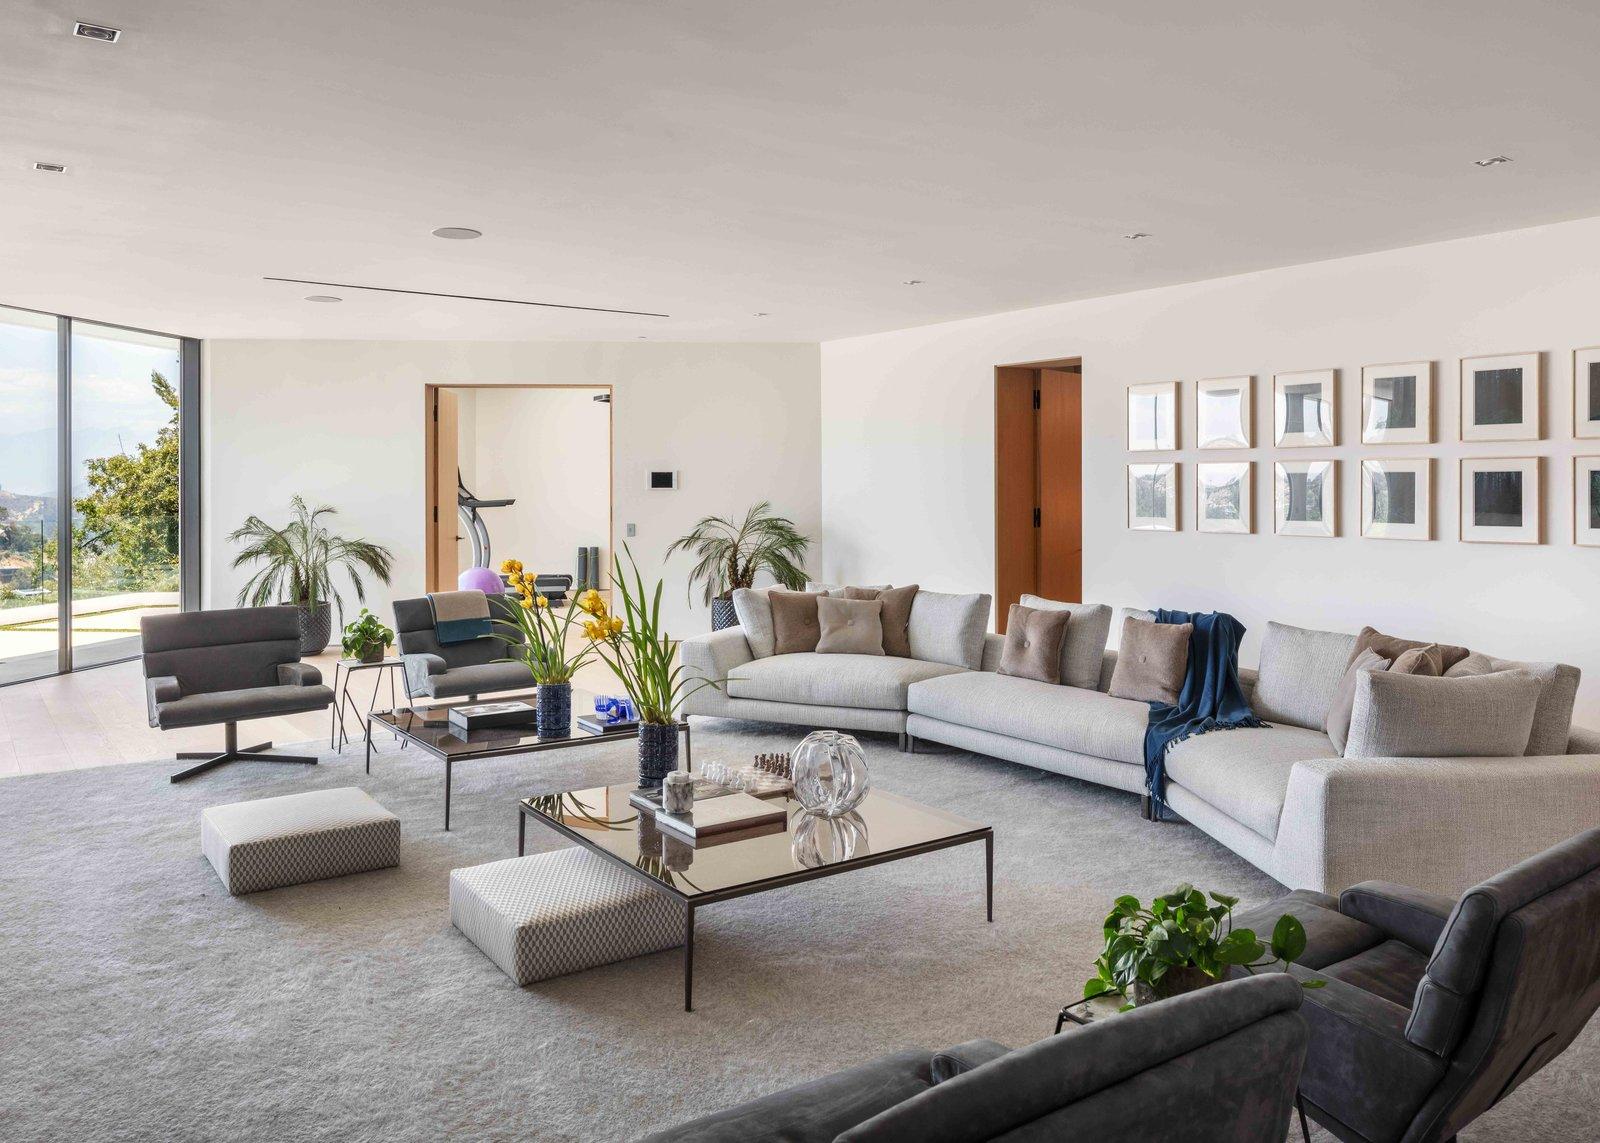 Carla House living room